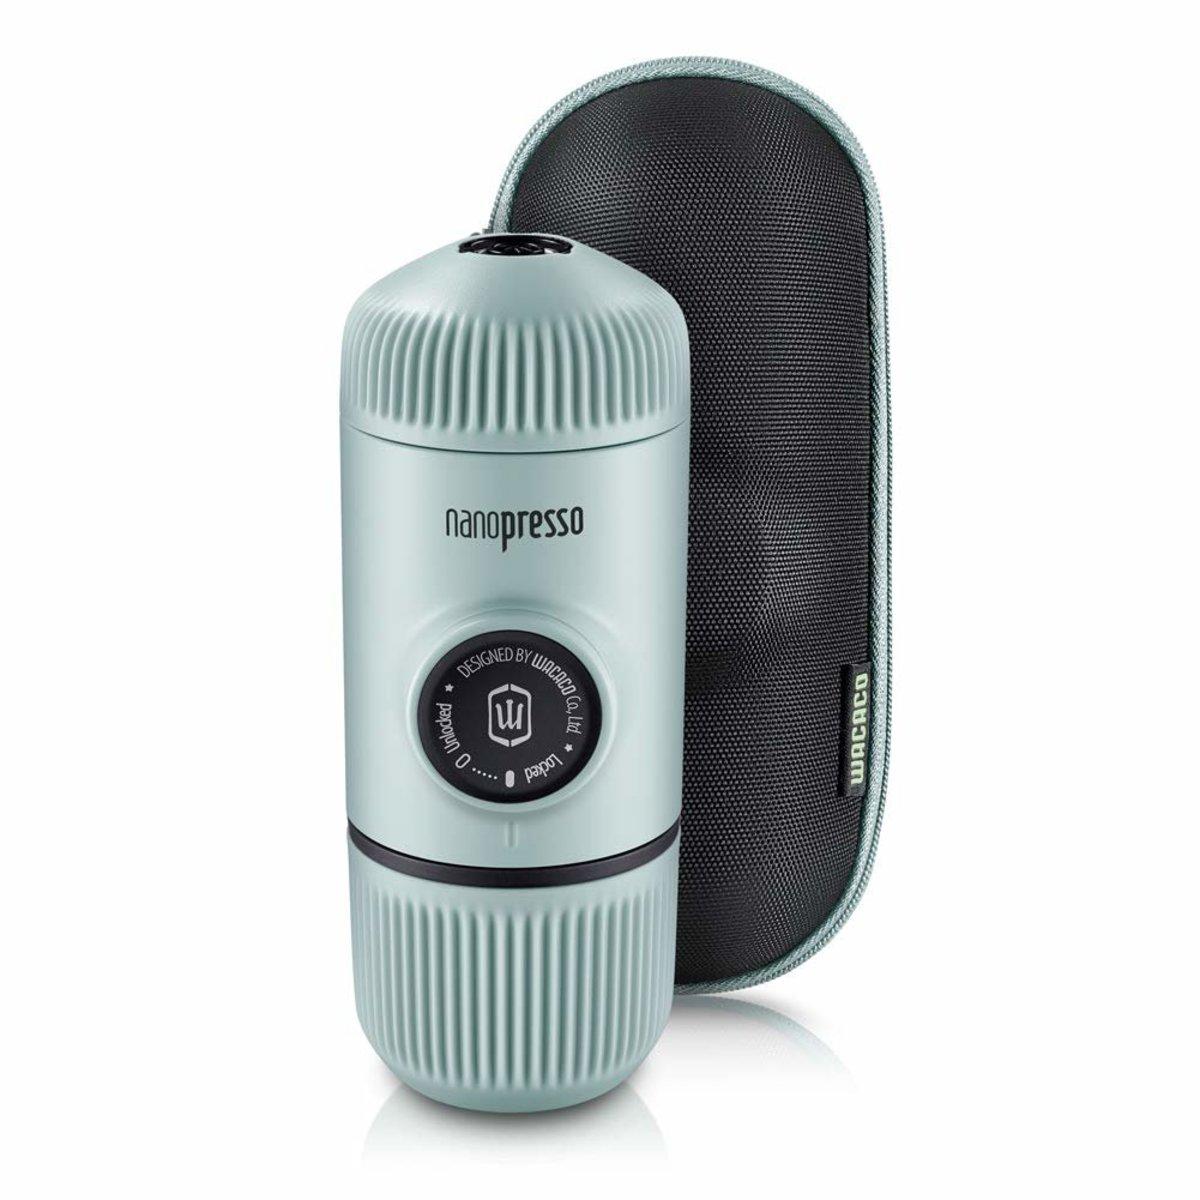 Nanopresso Portable Espresso Maker - Blue